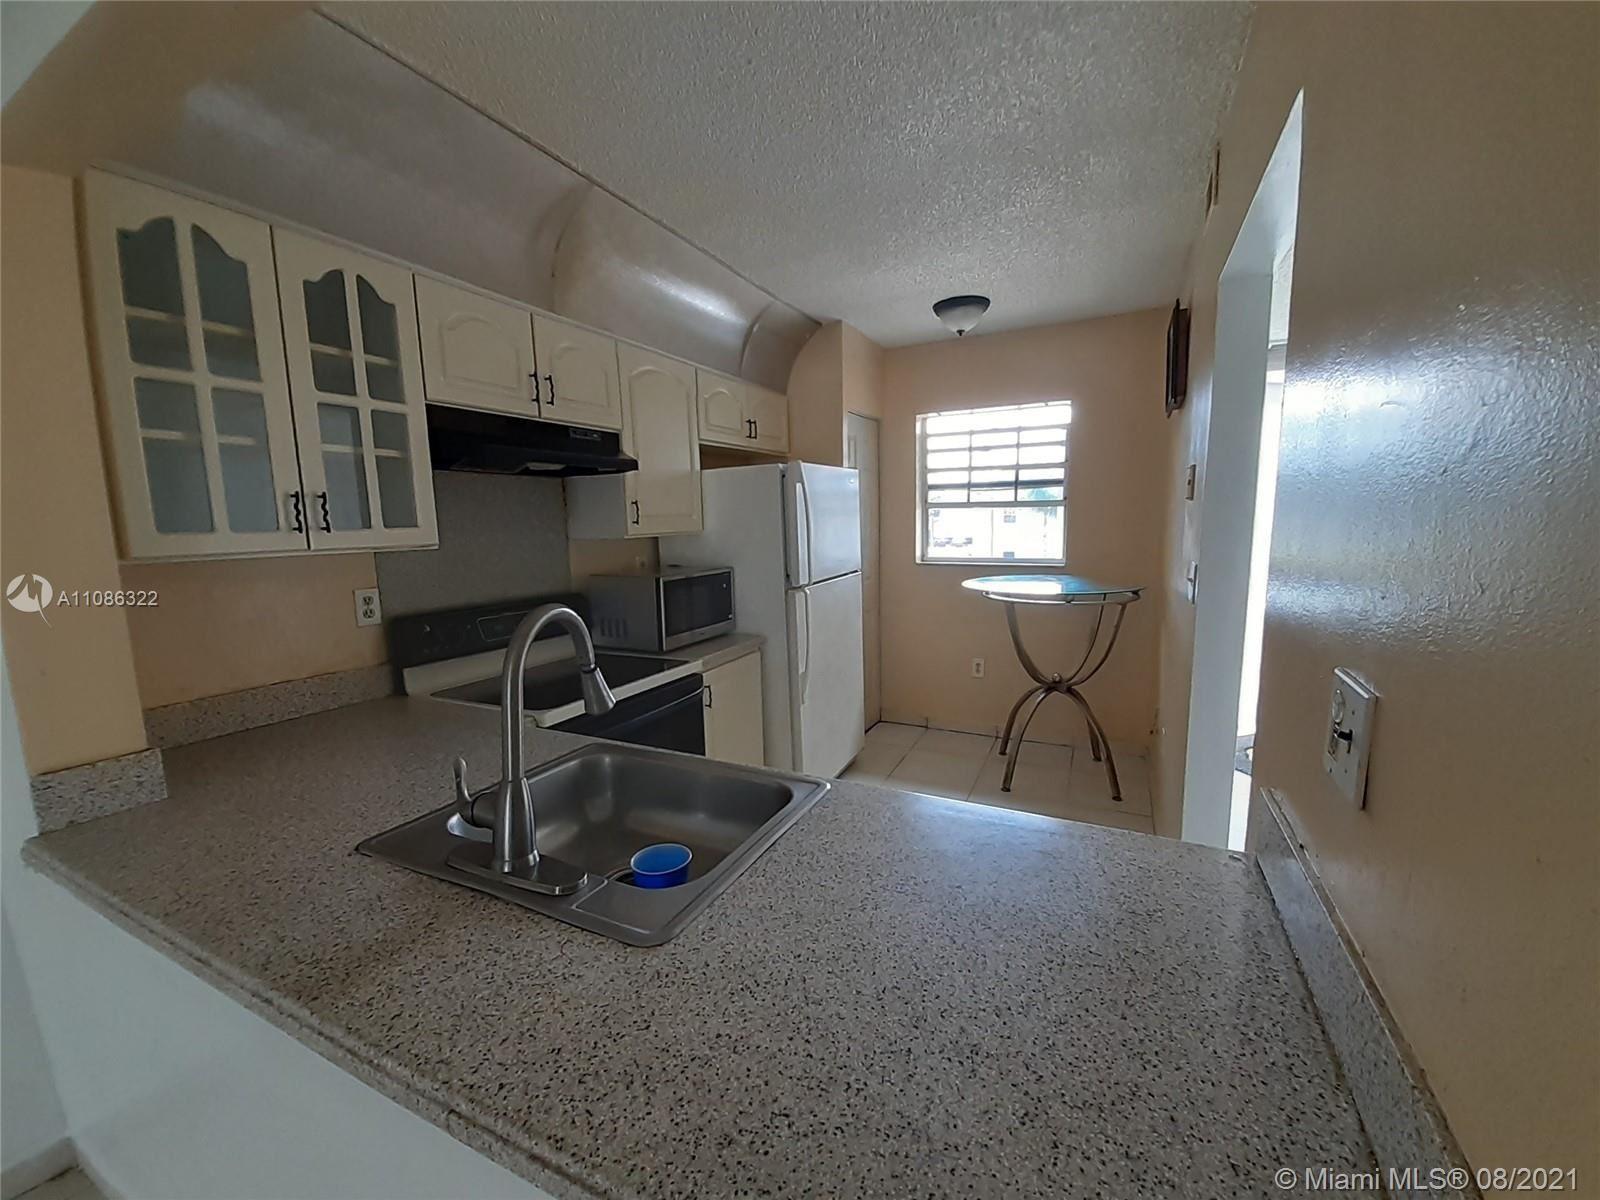 459 NE 210th Circle Ter #20217, Miami, FL 33179 - #: A11086322